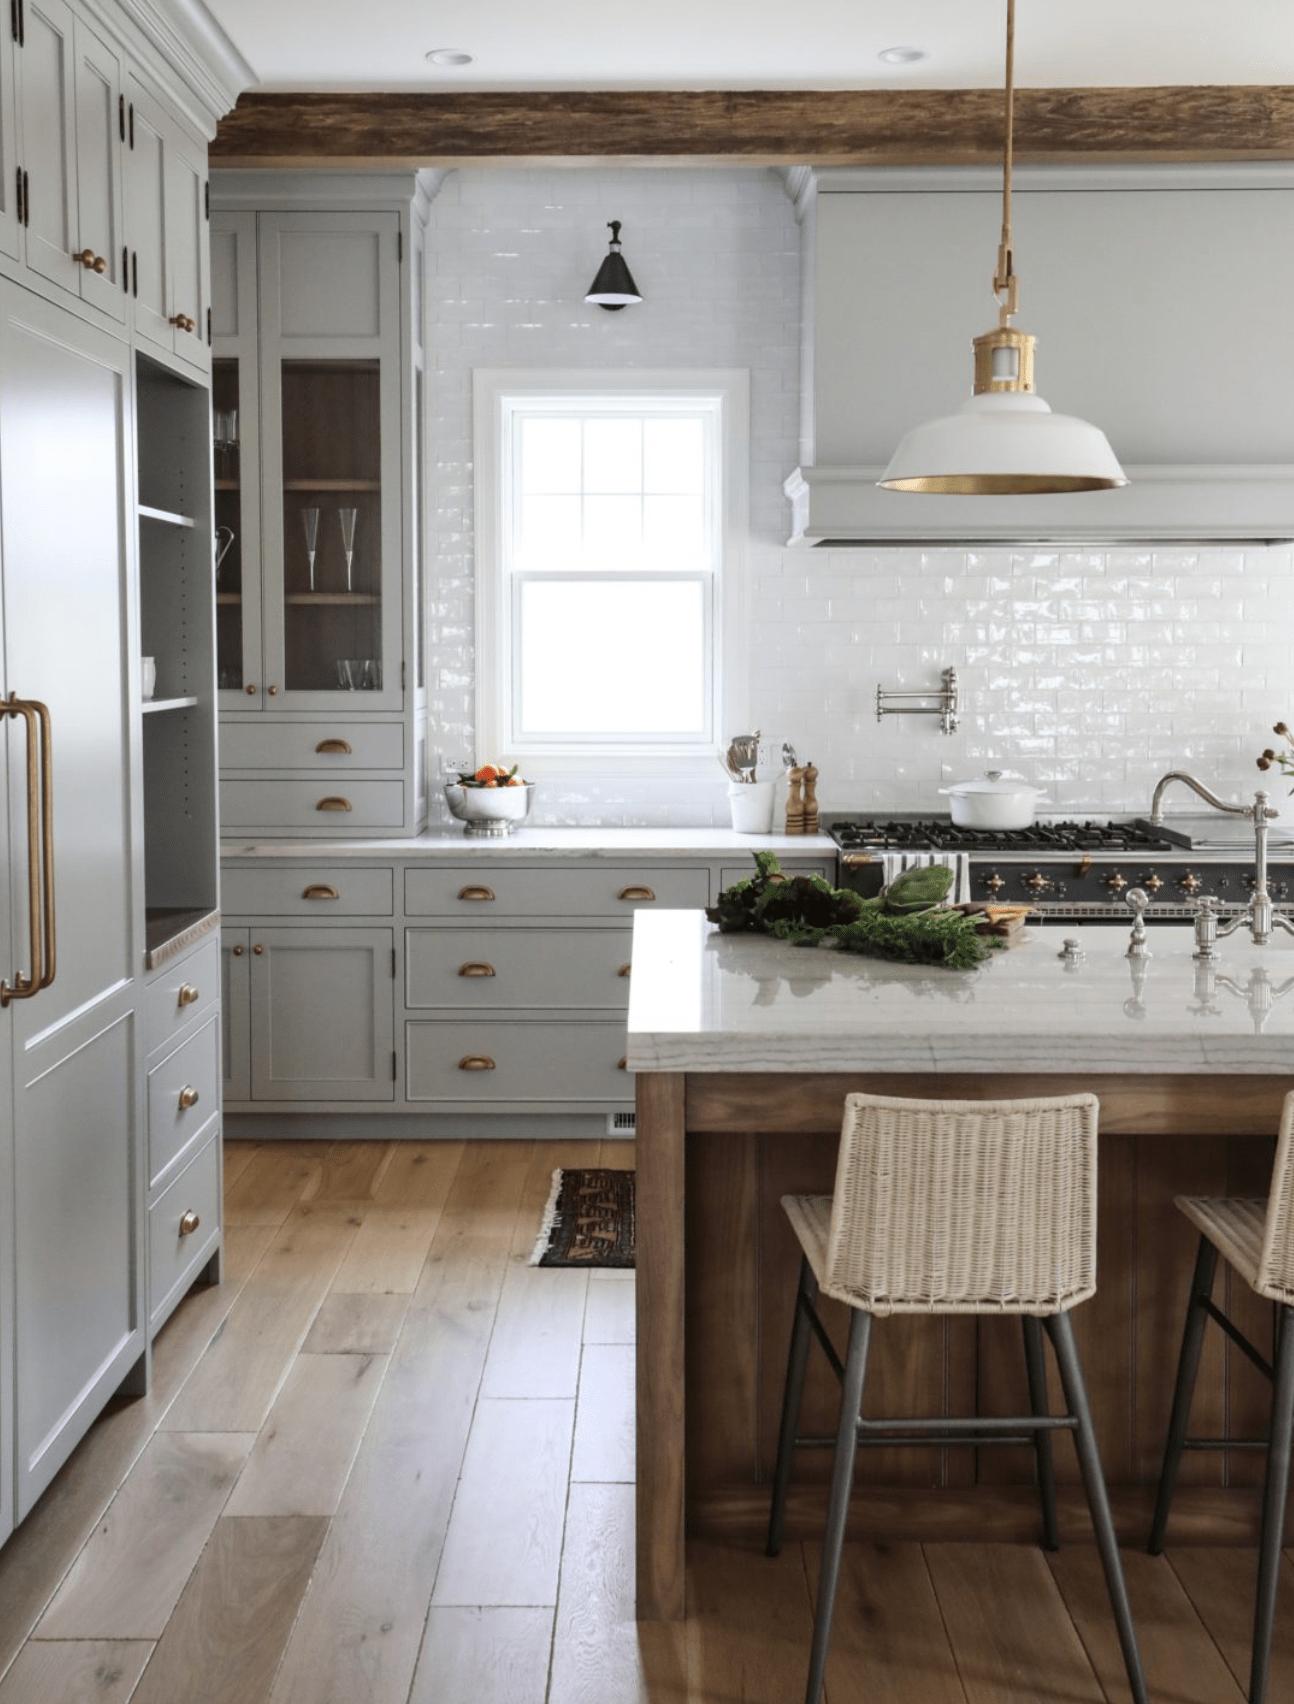 My Major Kitchen And Bathroom Design Inspiration Remodel New Kitchen Cabinets Interior Design Kitchen Kitchen Renovation